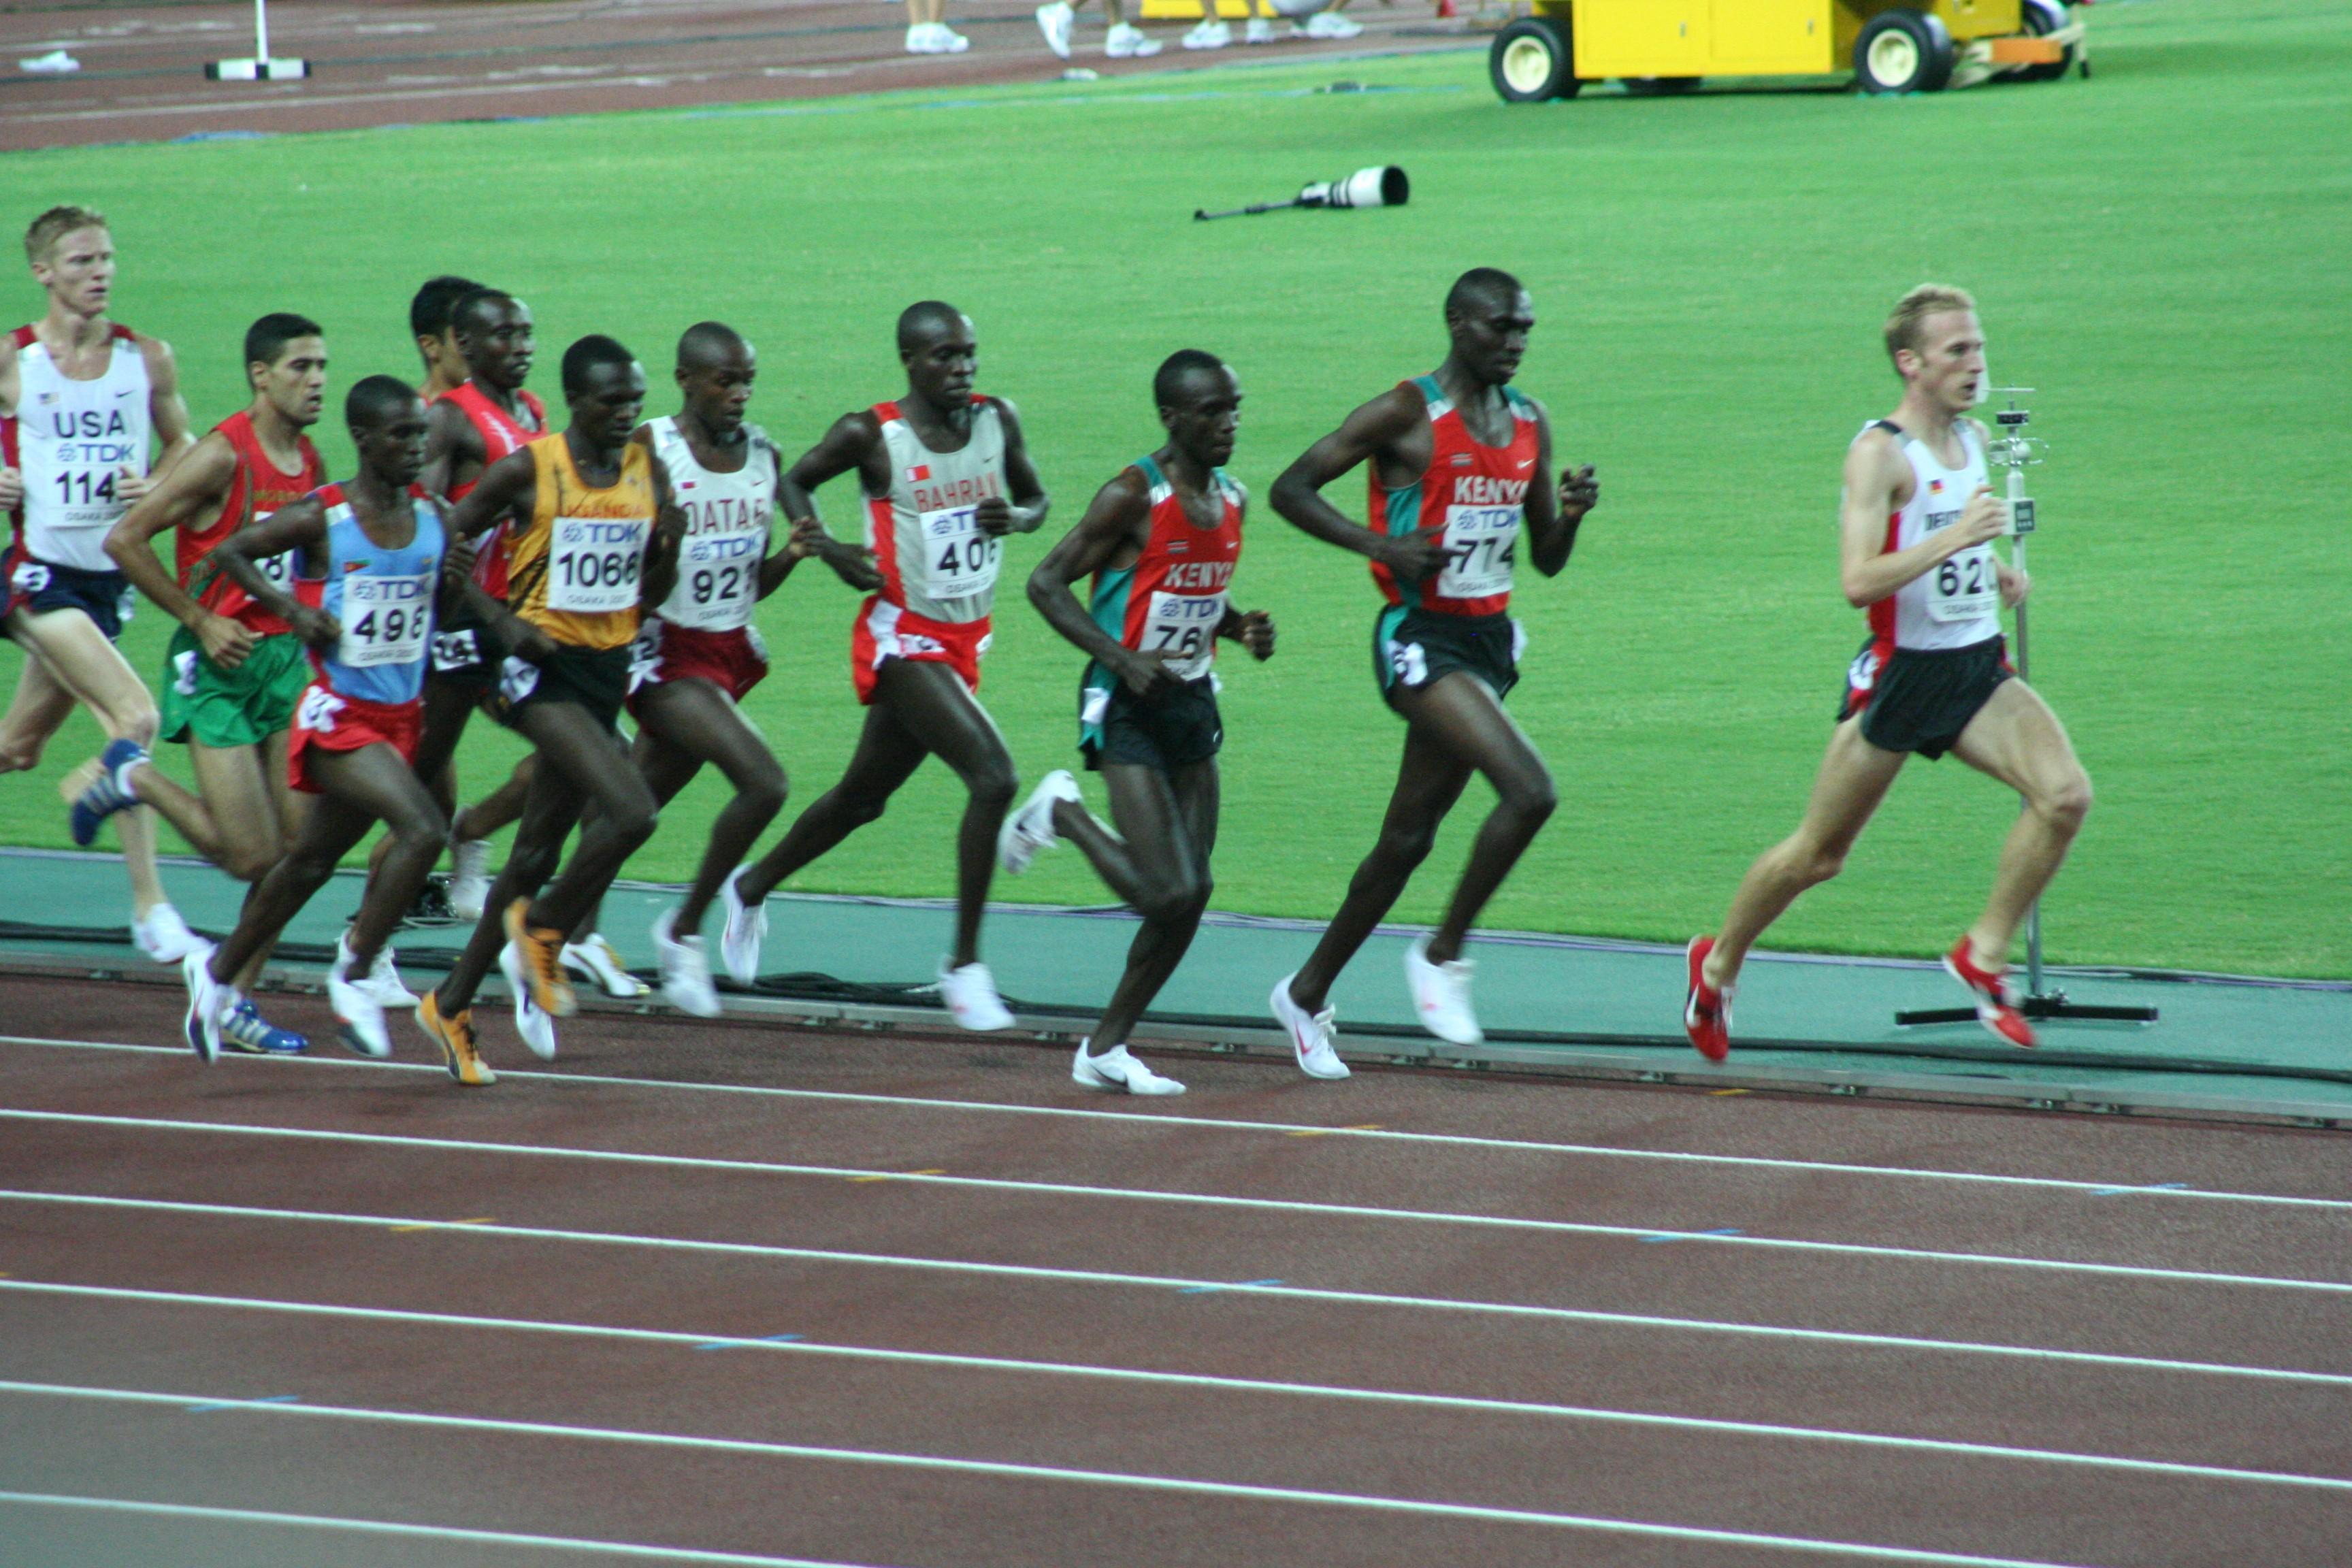 Lauf 5000 – 5000 Meter Meter – Wikipedia Lauf wZPXkuTOi